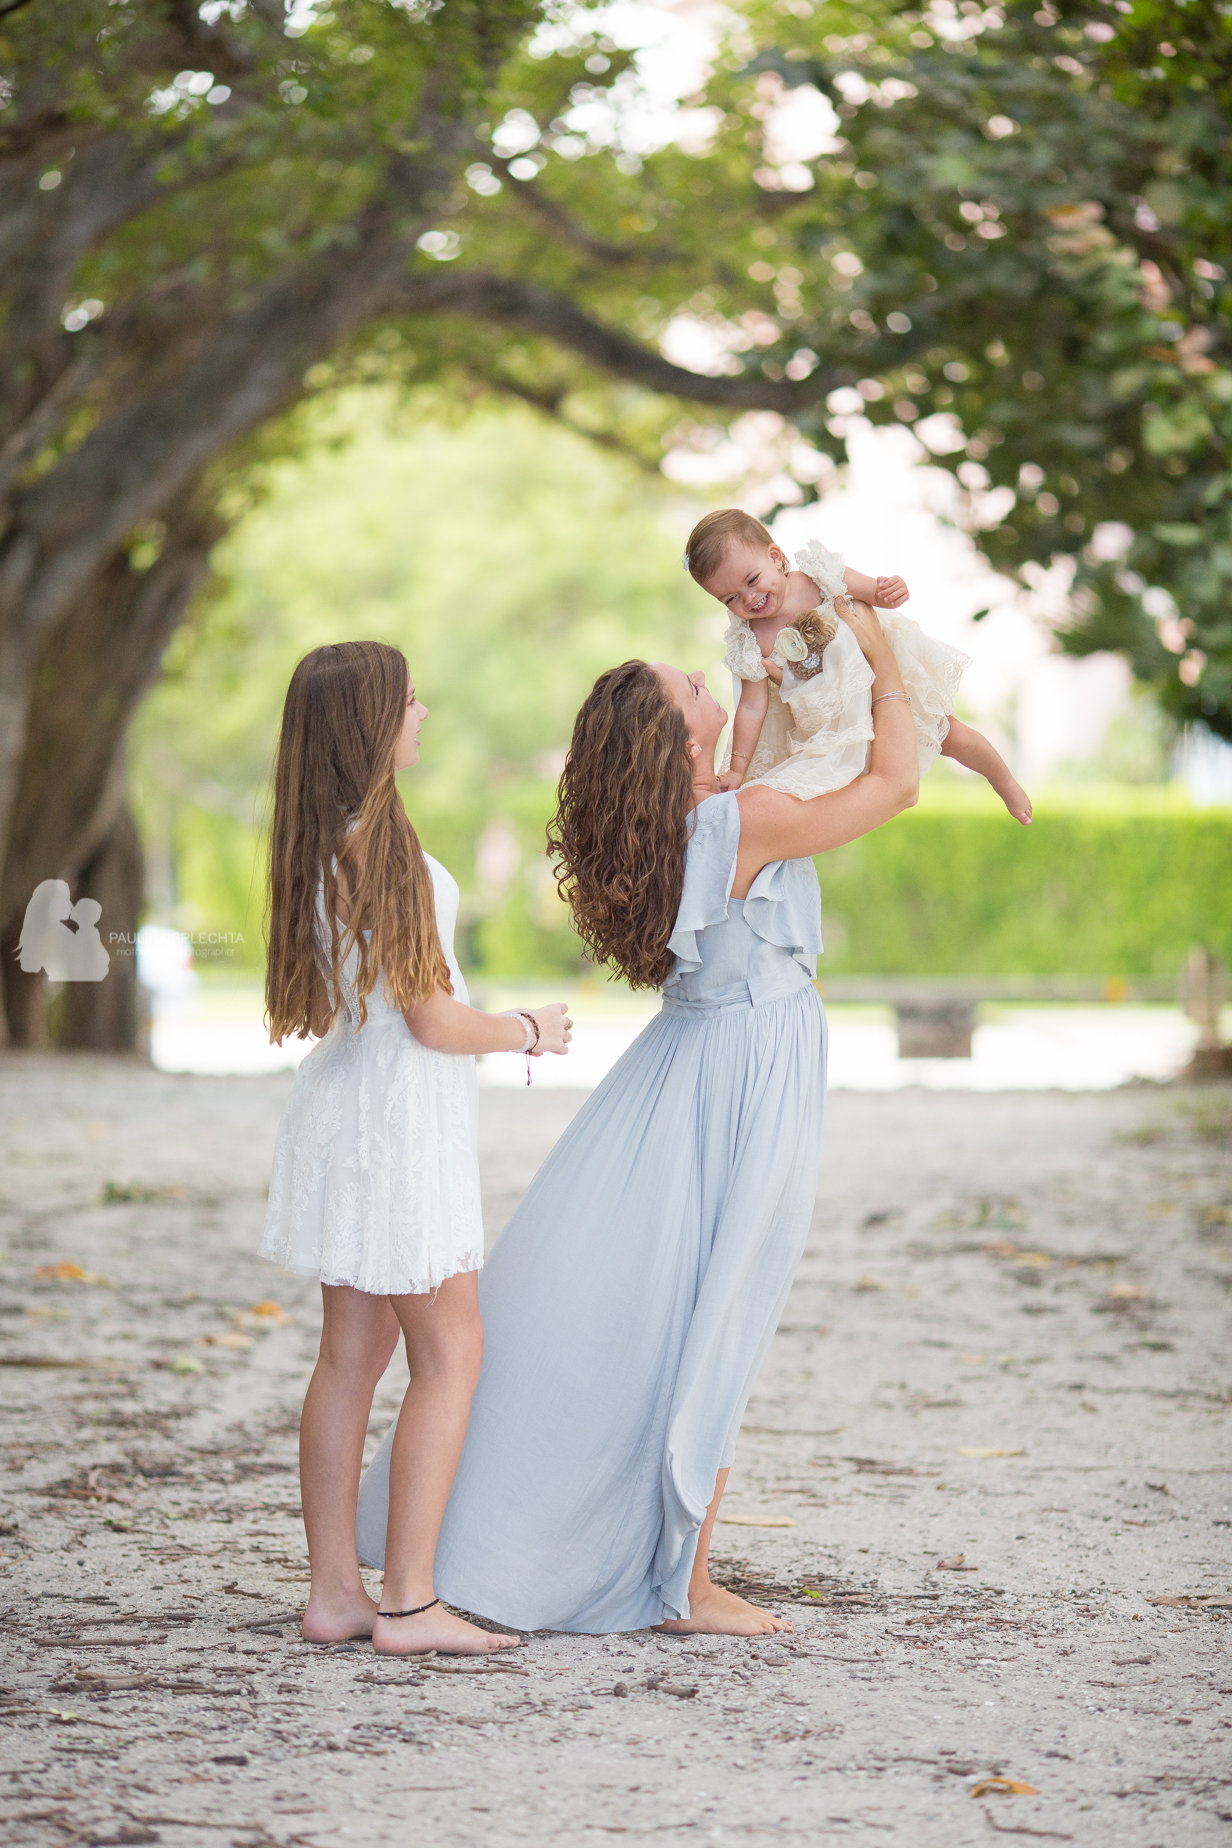 birth-photographer-breastfeeding-family-child-newborn-cake-smash-pregnancy-maternity-8.jpg